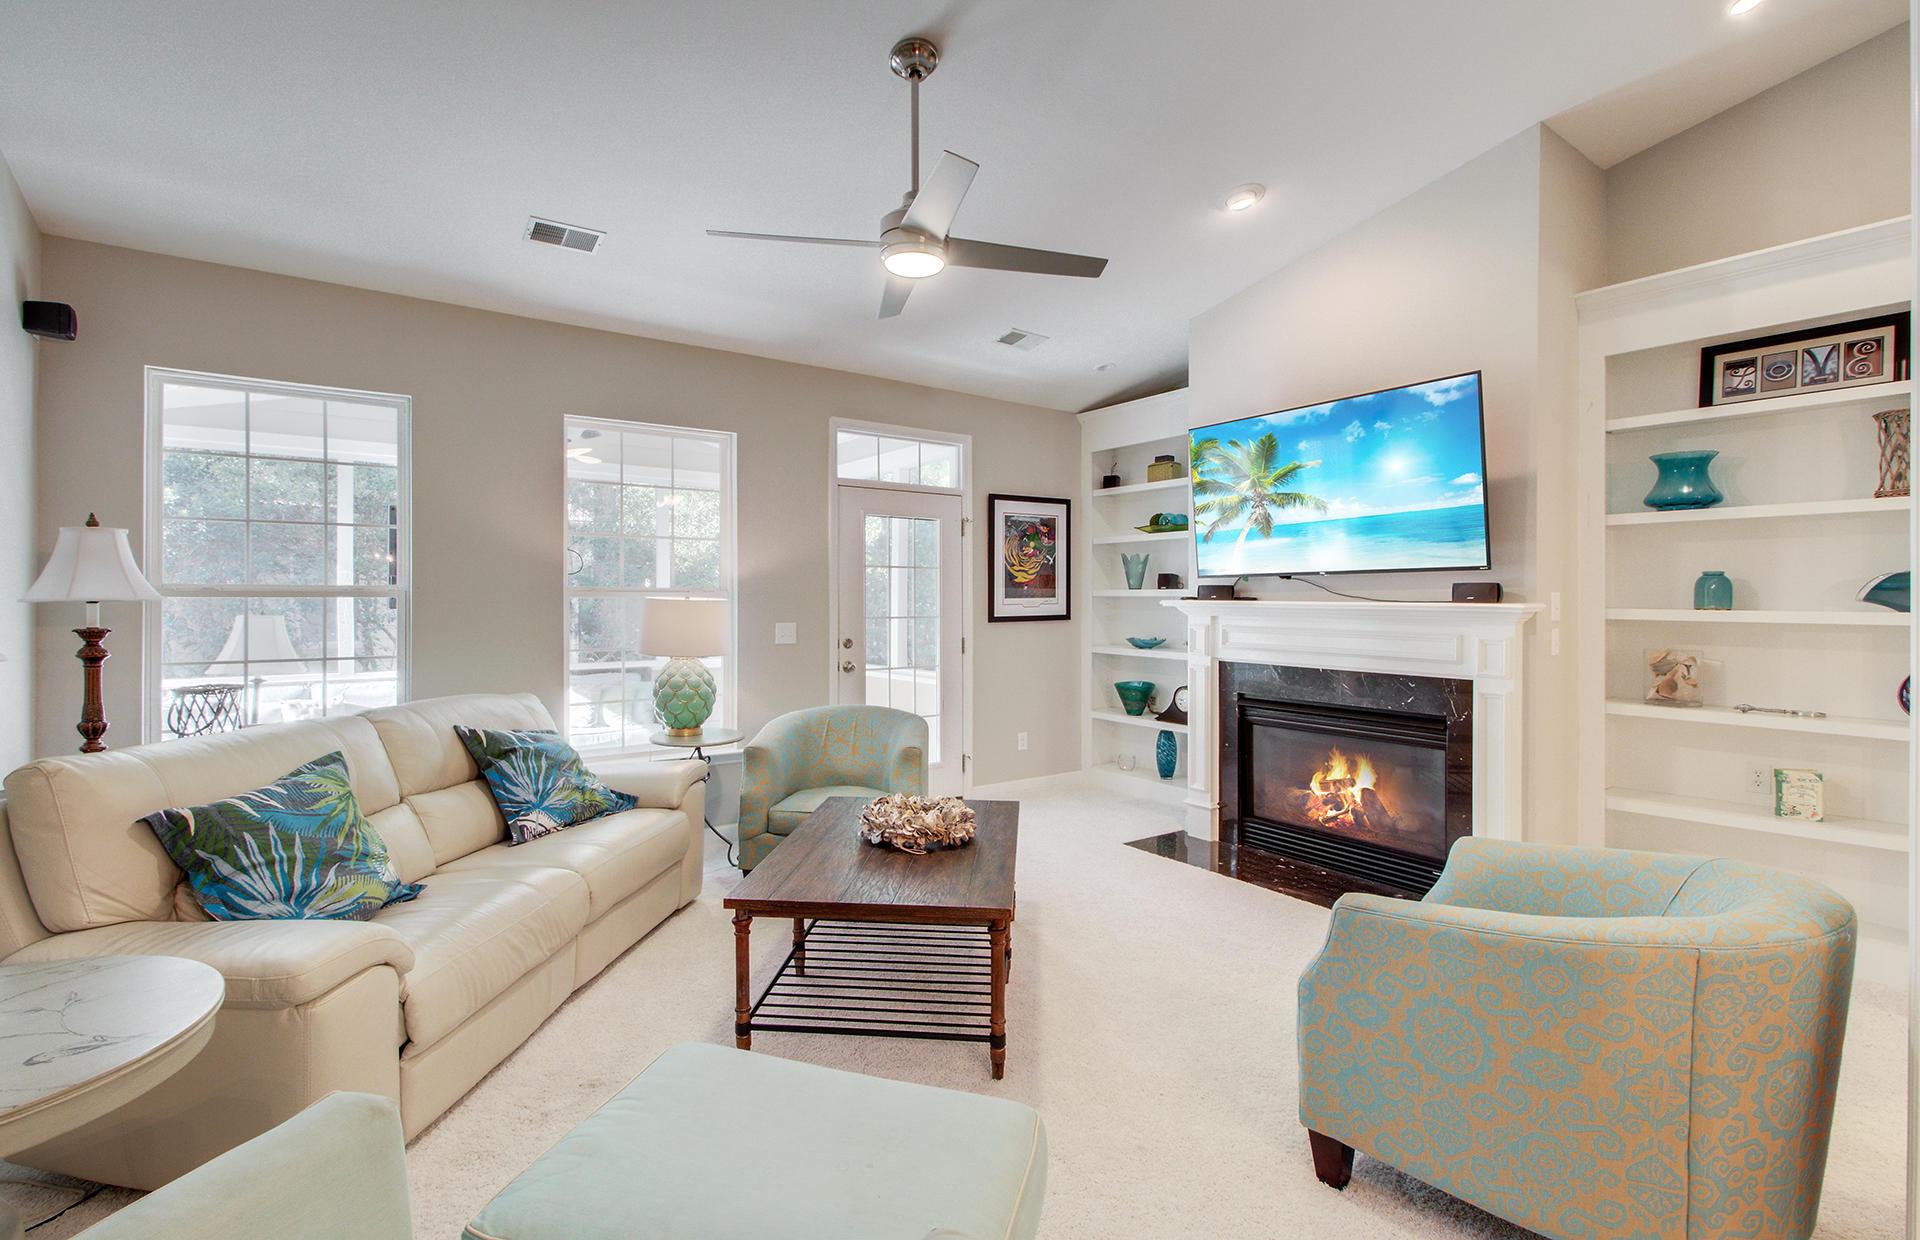 Dunes West Homes For Sale - 145 Fresh Meadow, Mount Pleasant, SC - 16